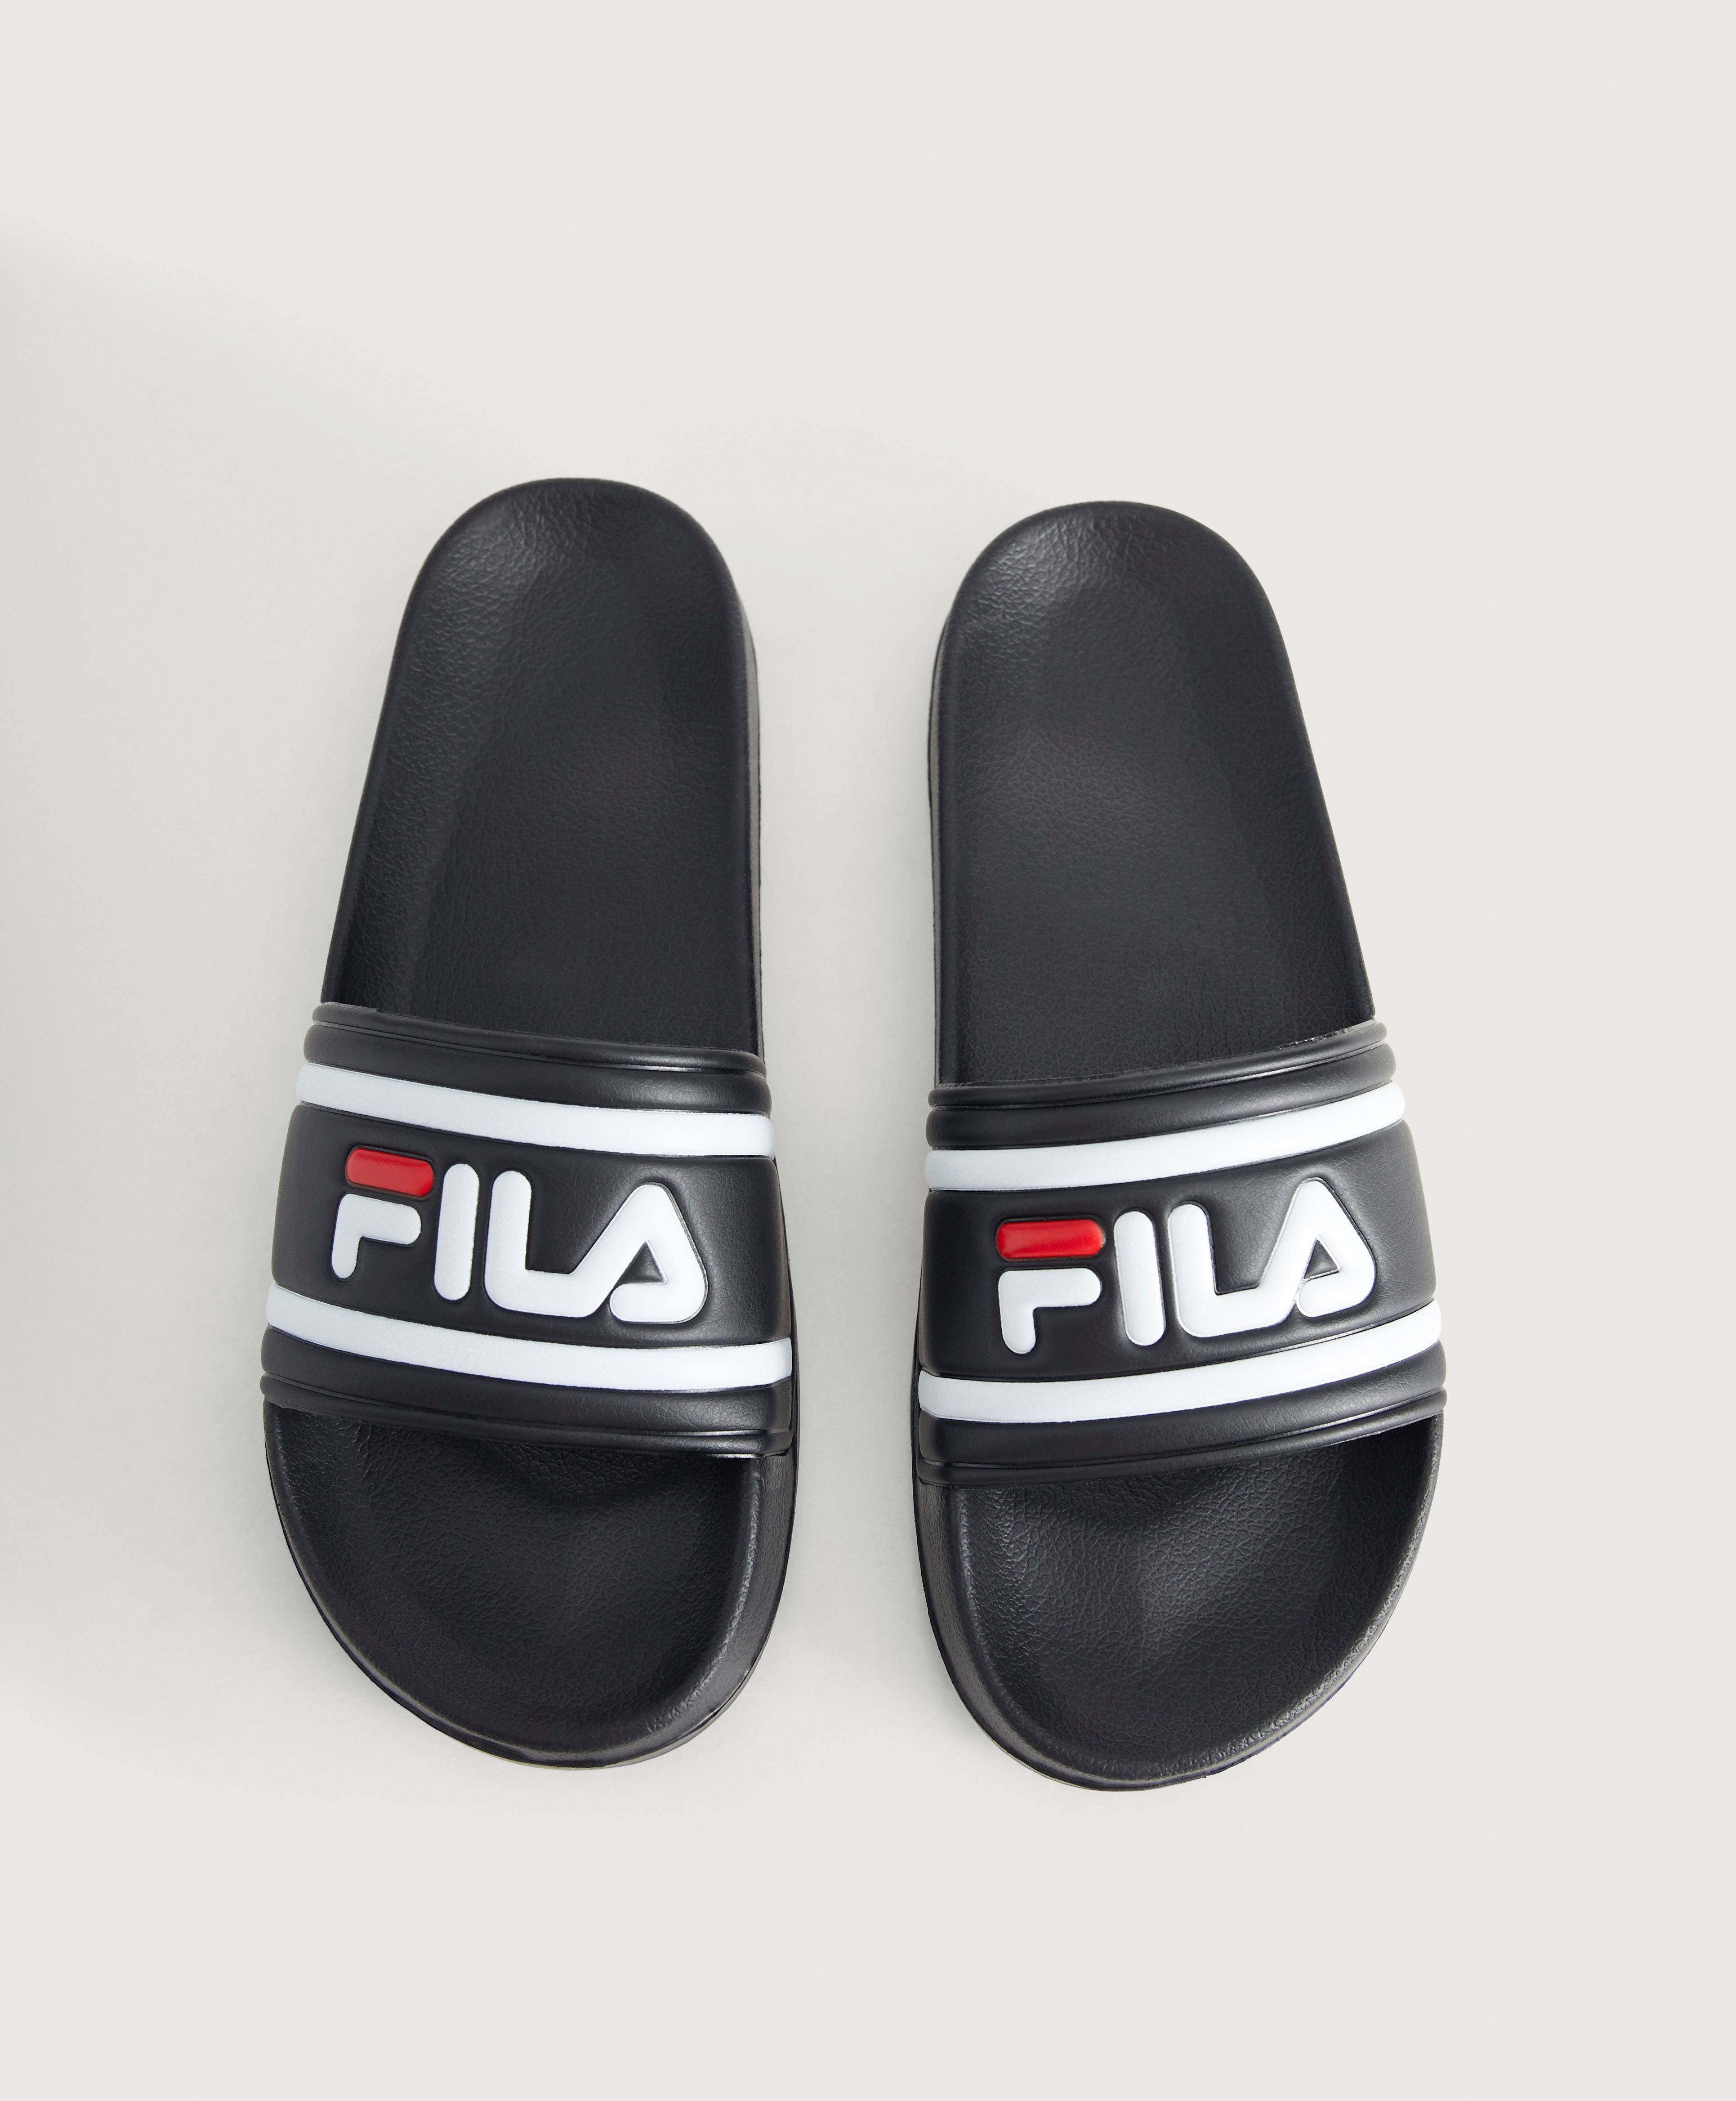 FILA Slippers Morro Bay Slipper Hvit Sko Stayhard.no